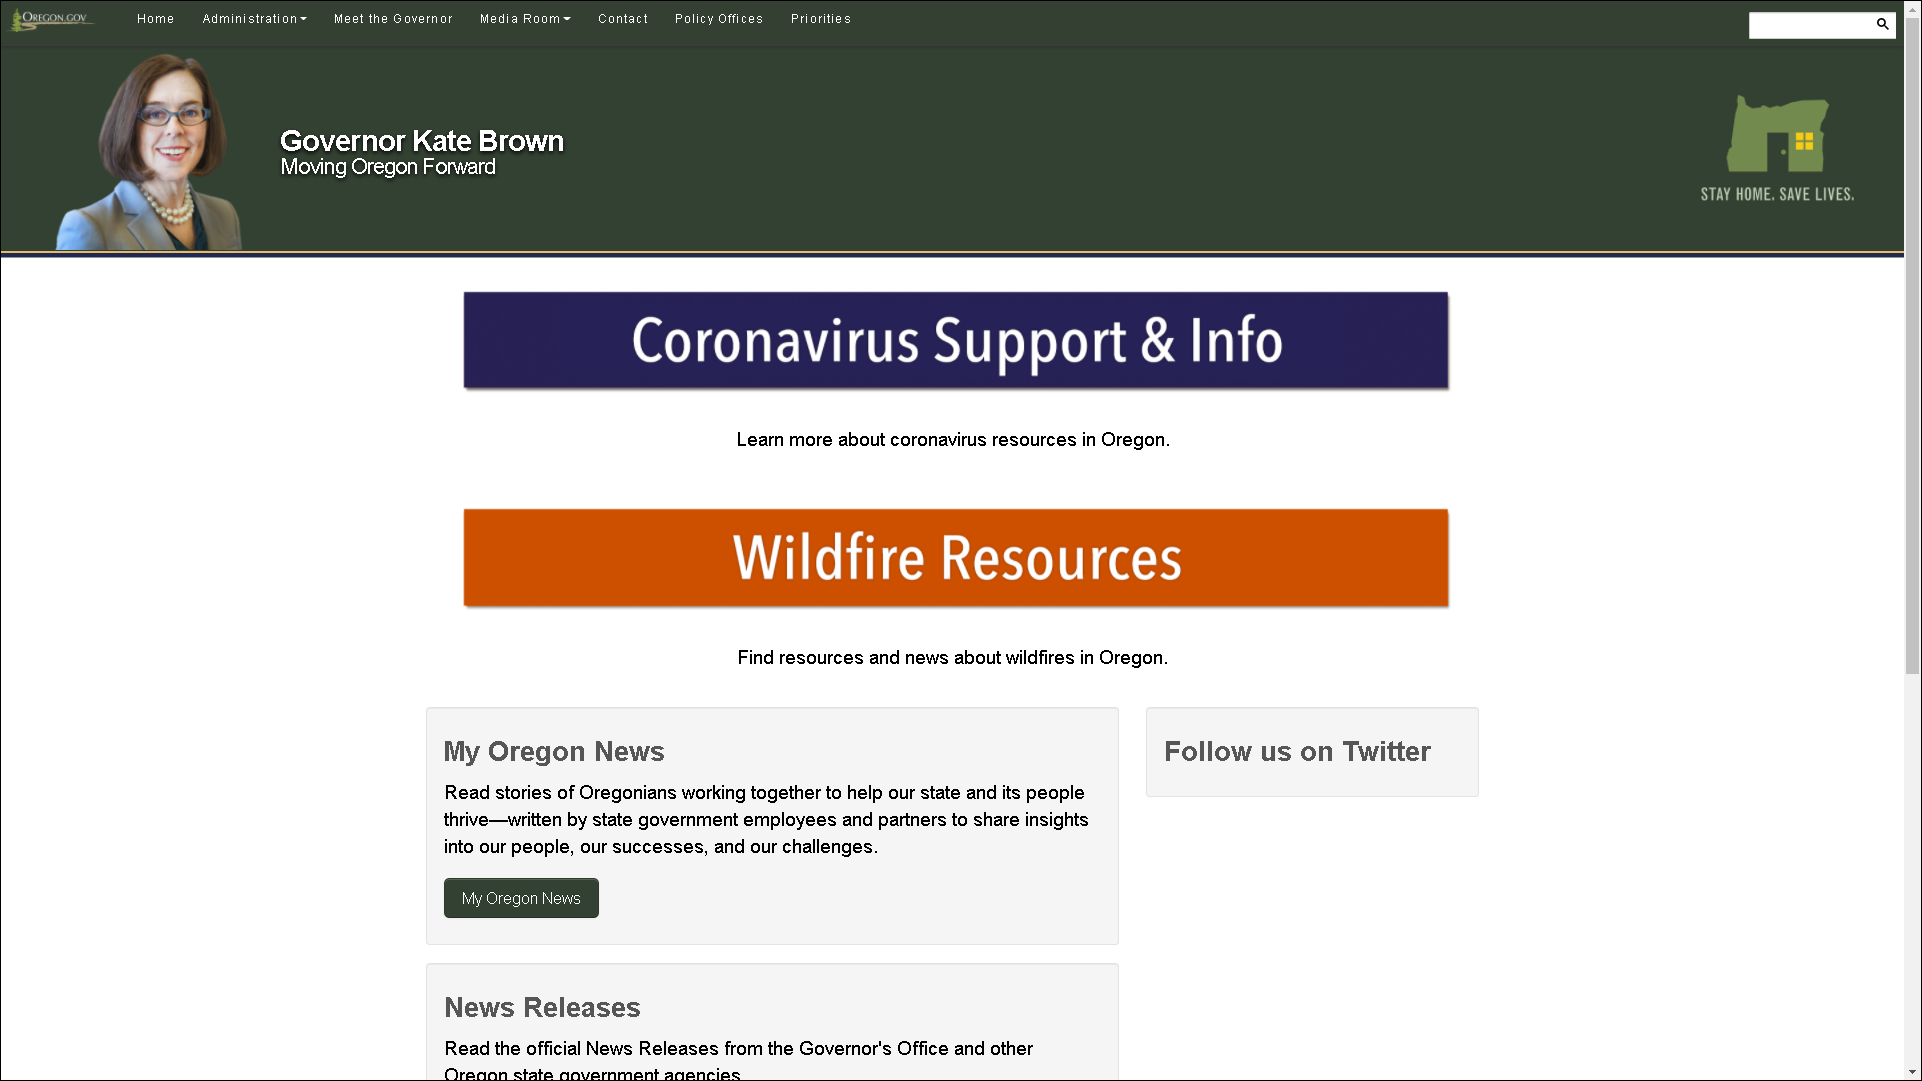 Screenshot of Oregon Governor Kate Brown's website